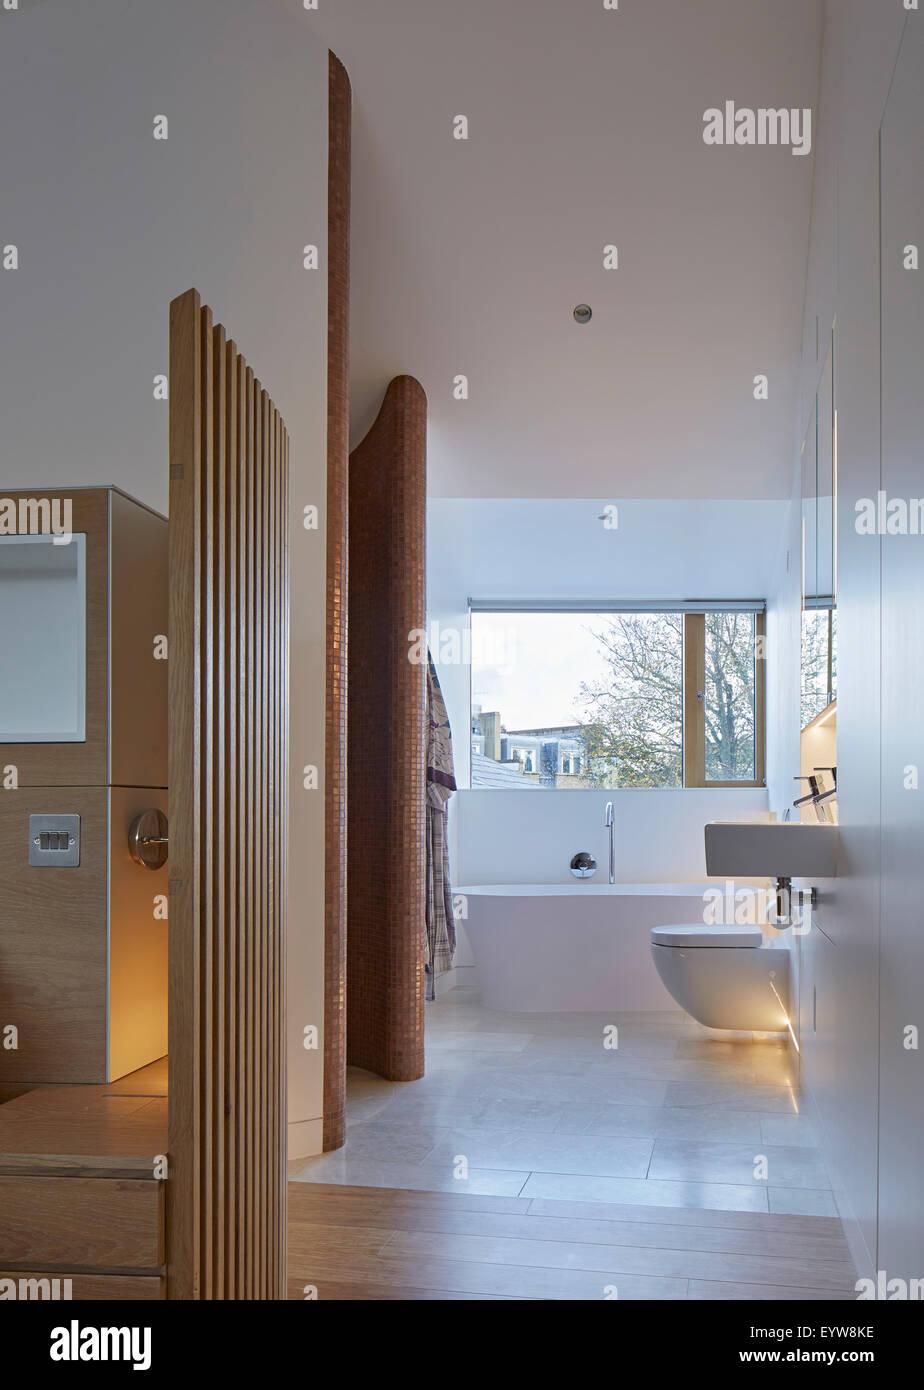 Bathroom Windows London bathroom with large rectangular window. london brownstones, london